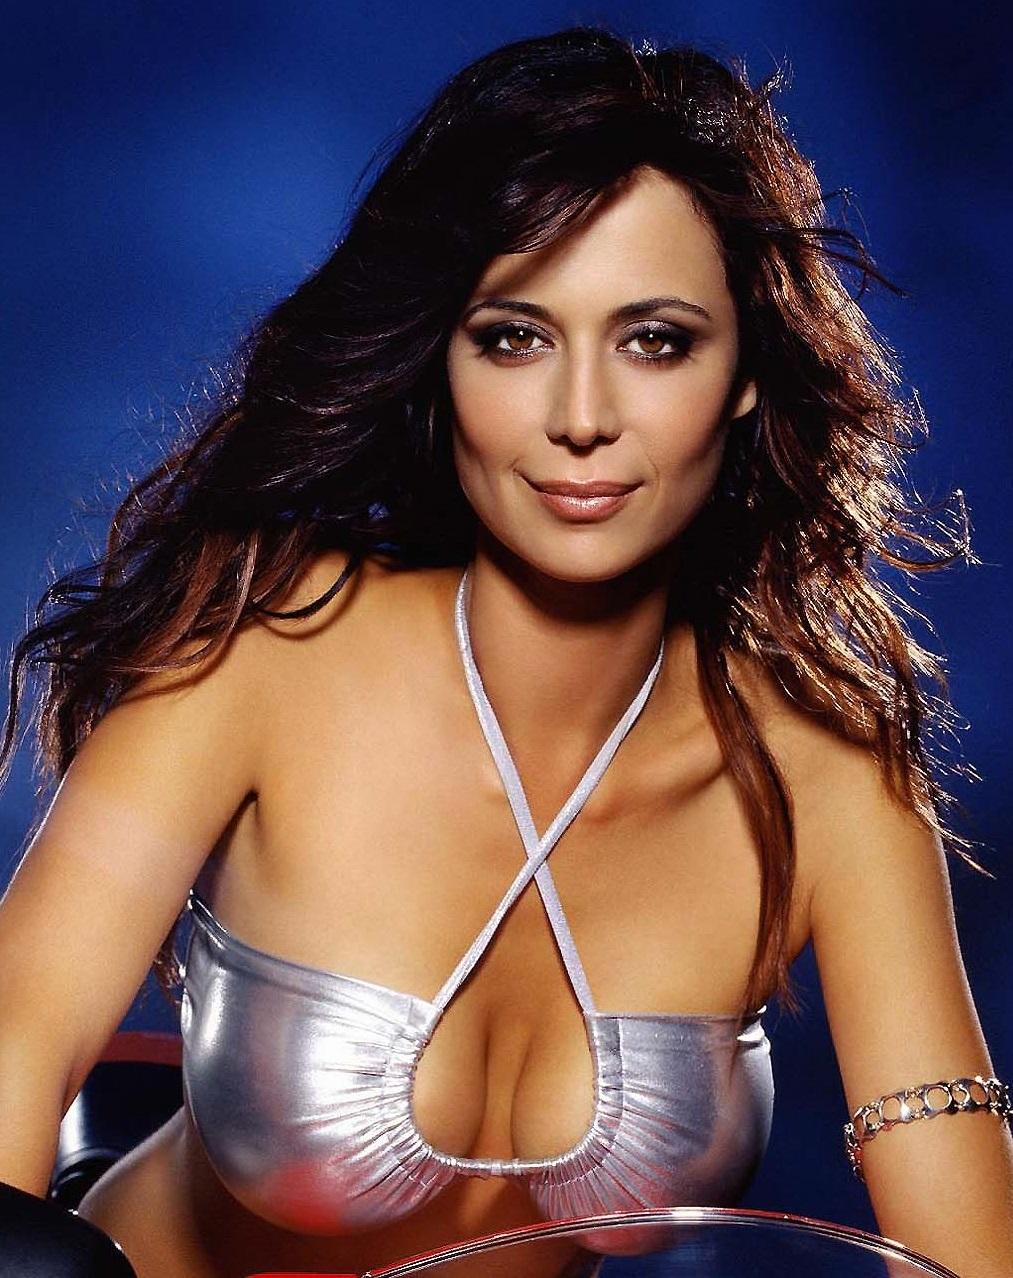 iranian american actress catherine bell hot expose pics